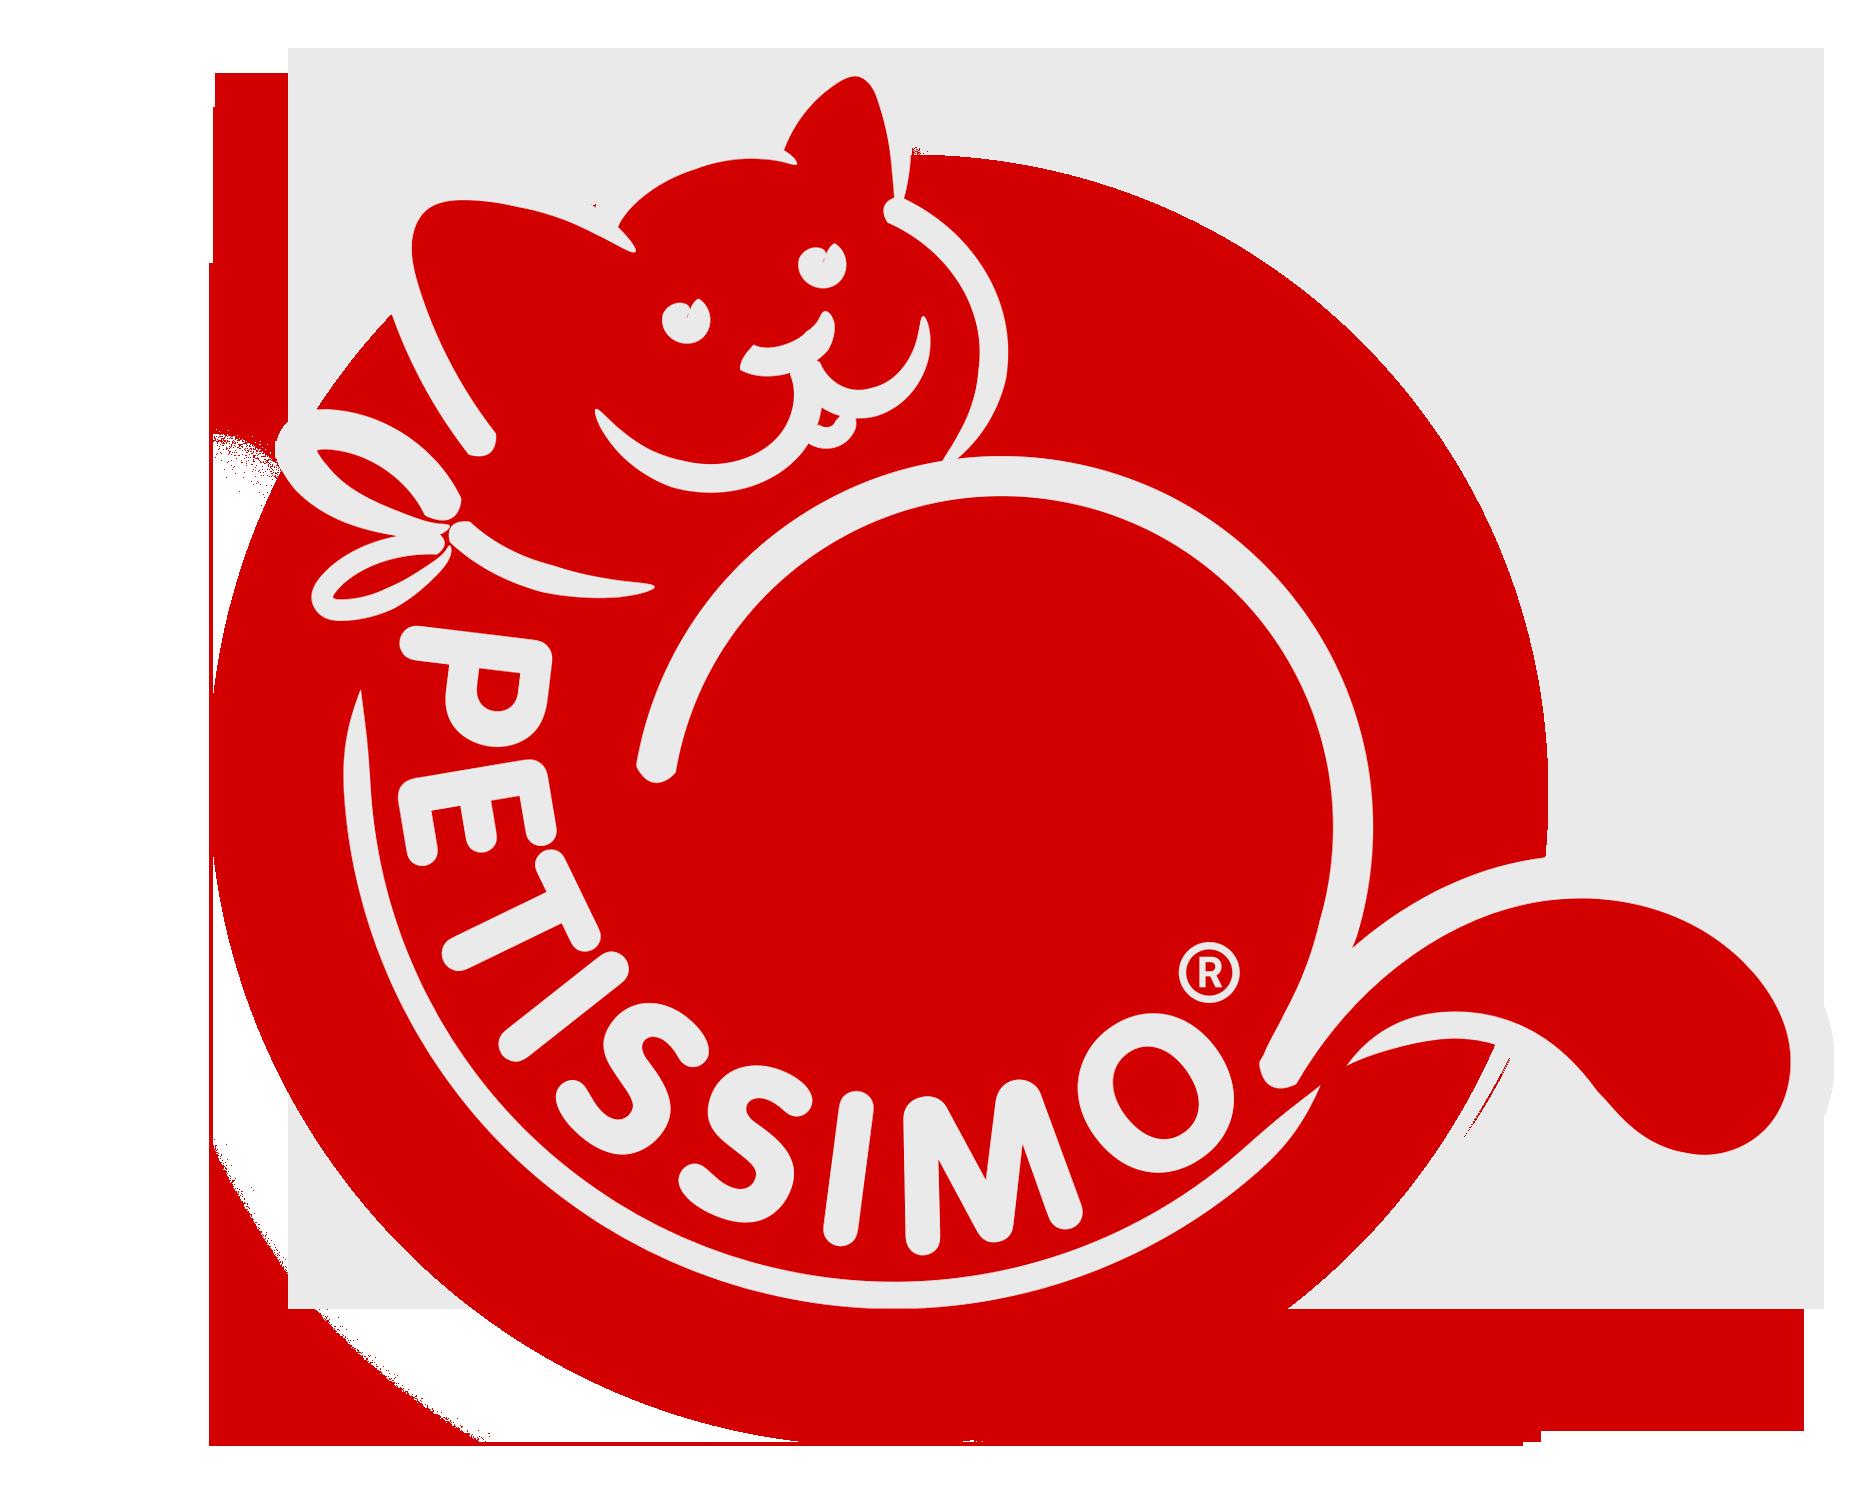 Petissimo Graphic Design